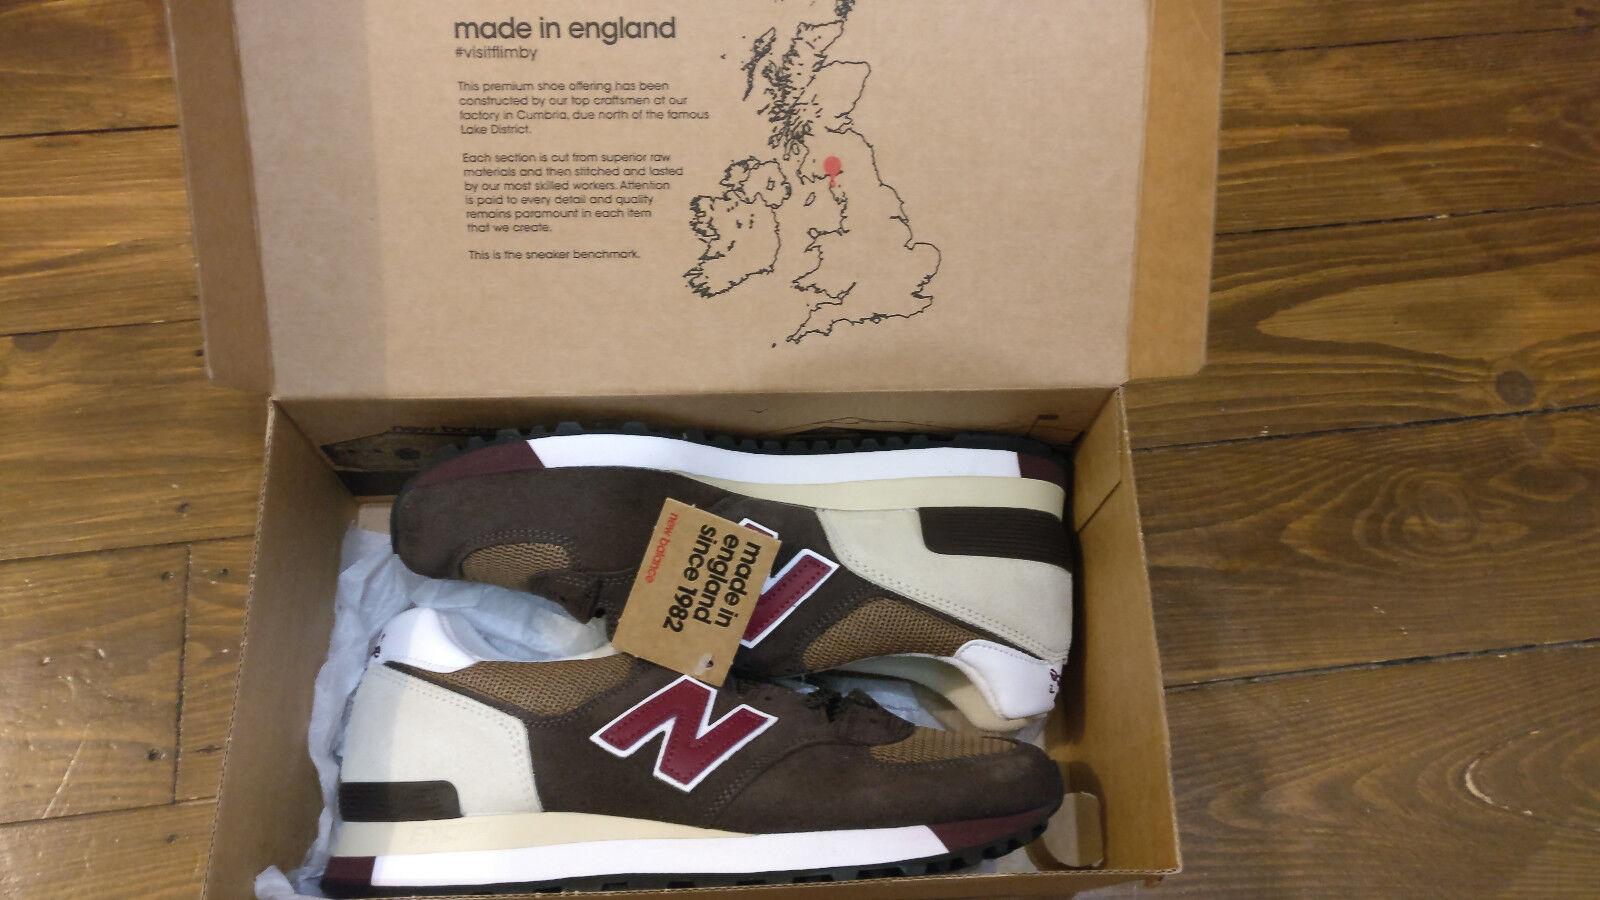 NEW Balance 577 Scarpe da ginnastica (come 574)   MARRONE   UK TG 7.5   Nuovi   Made in UK